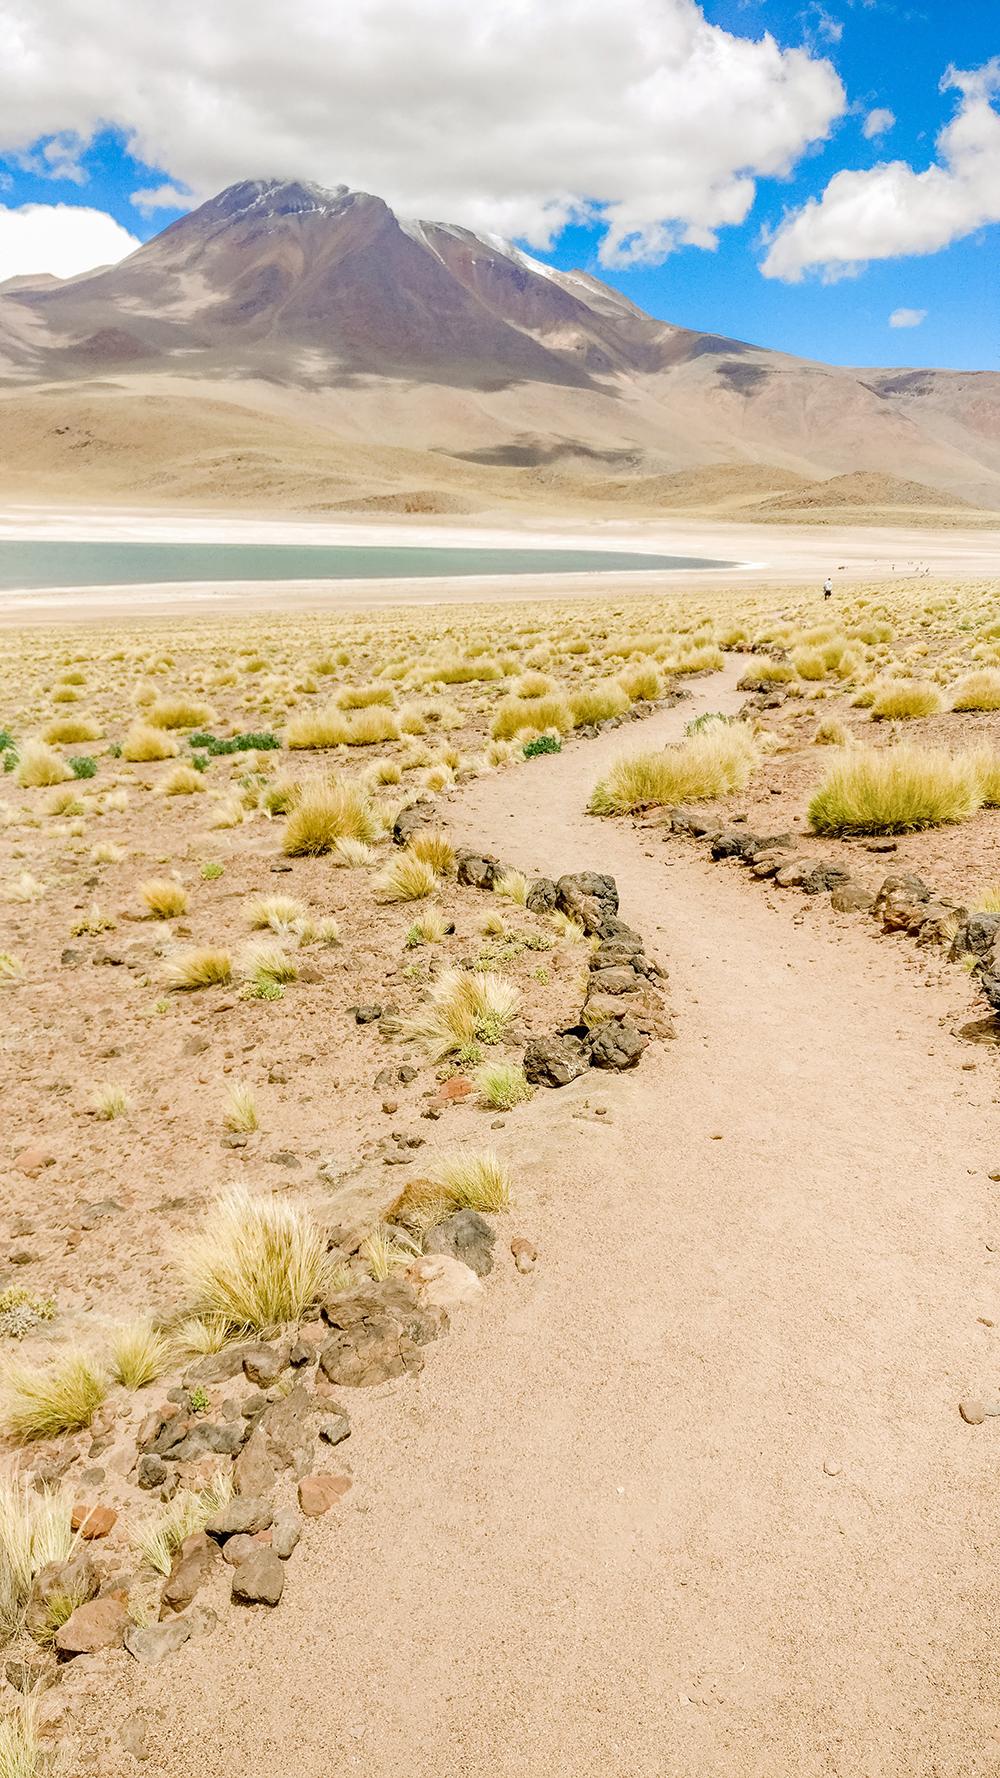 Laguna Miscanti (Lagunas Altiplanicas) - How to plan your perfect trip to San Pedro de Atacama, Chile? | Aliz's Wonderland